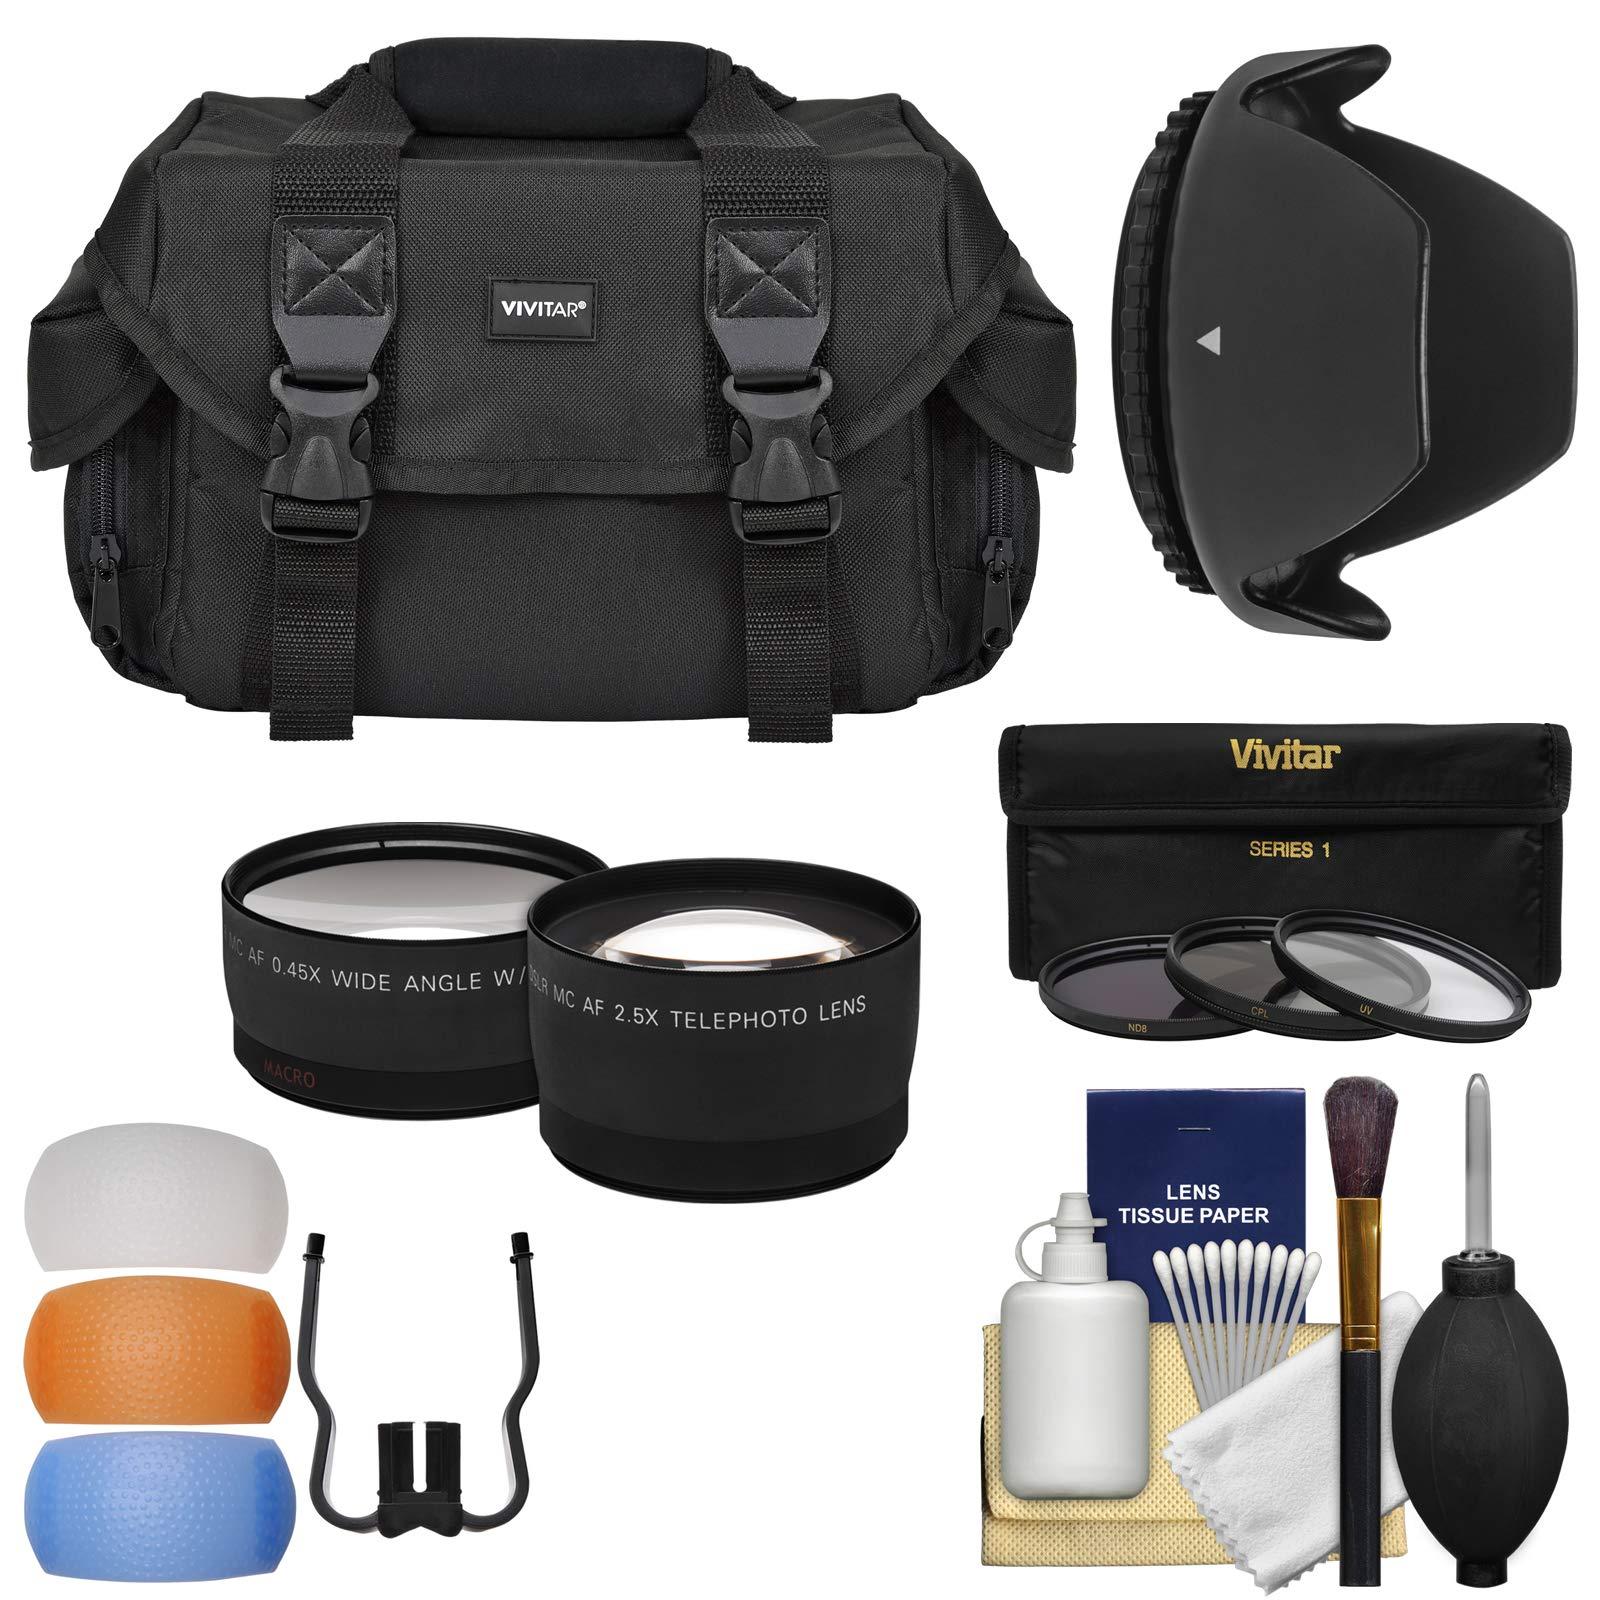 Essentials Bundle for Nikon D3300, D3400, D3500, D5500, D5600 Camera & 18-55mm VR Lens with Case + Wide/Tele Lenses + 3 UV/CPL/ND8 Filters + Hood Kit